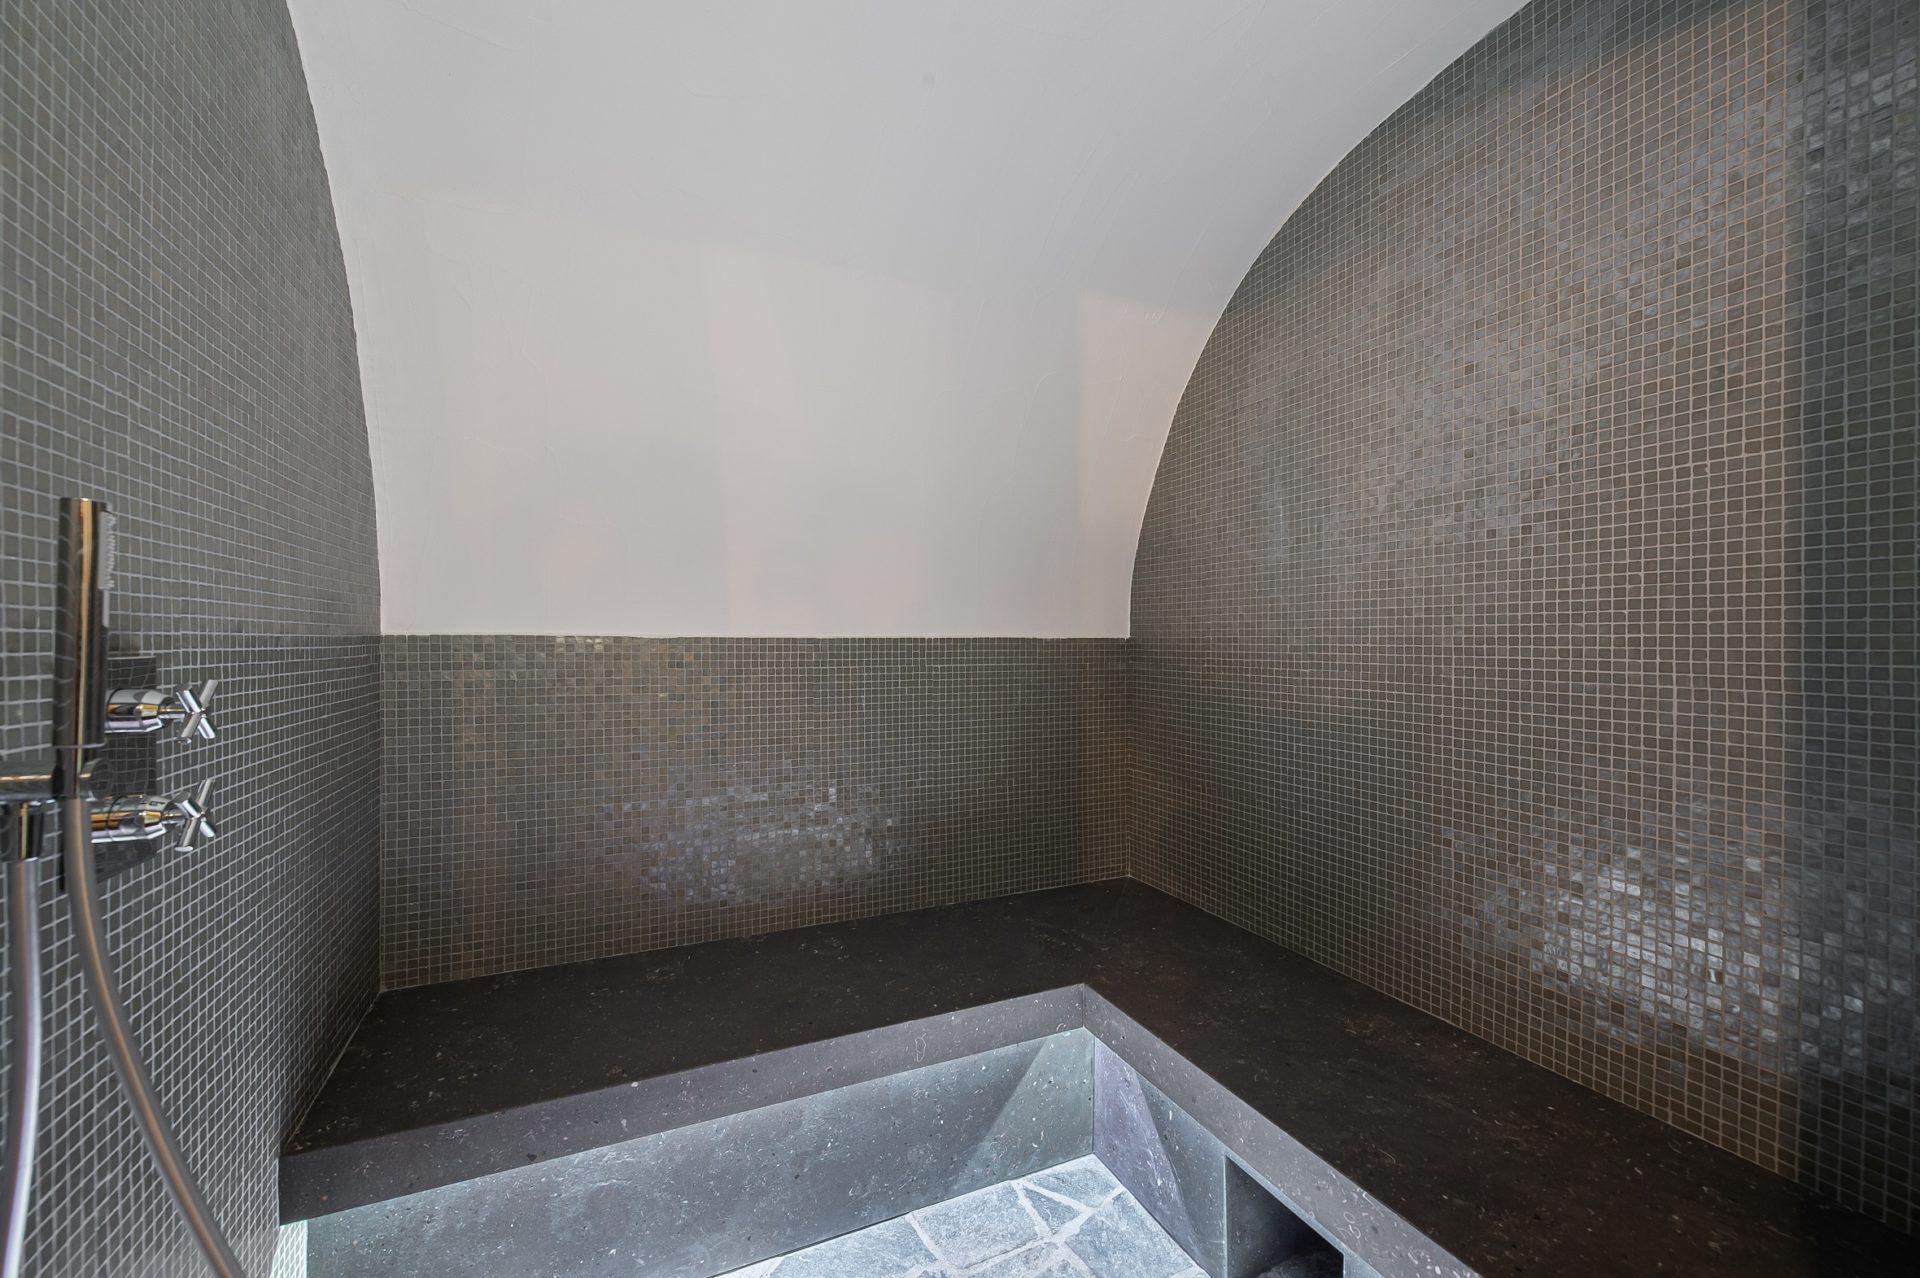 L'Epicerie / Appartement 1 / Hammam / Saint Martin de Belleville, Savoie